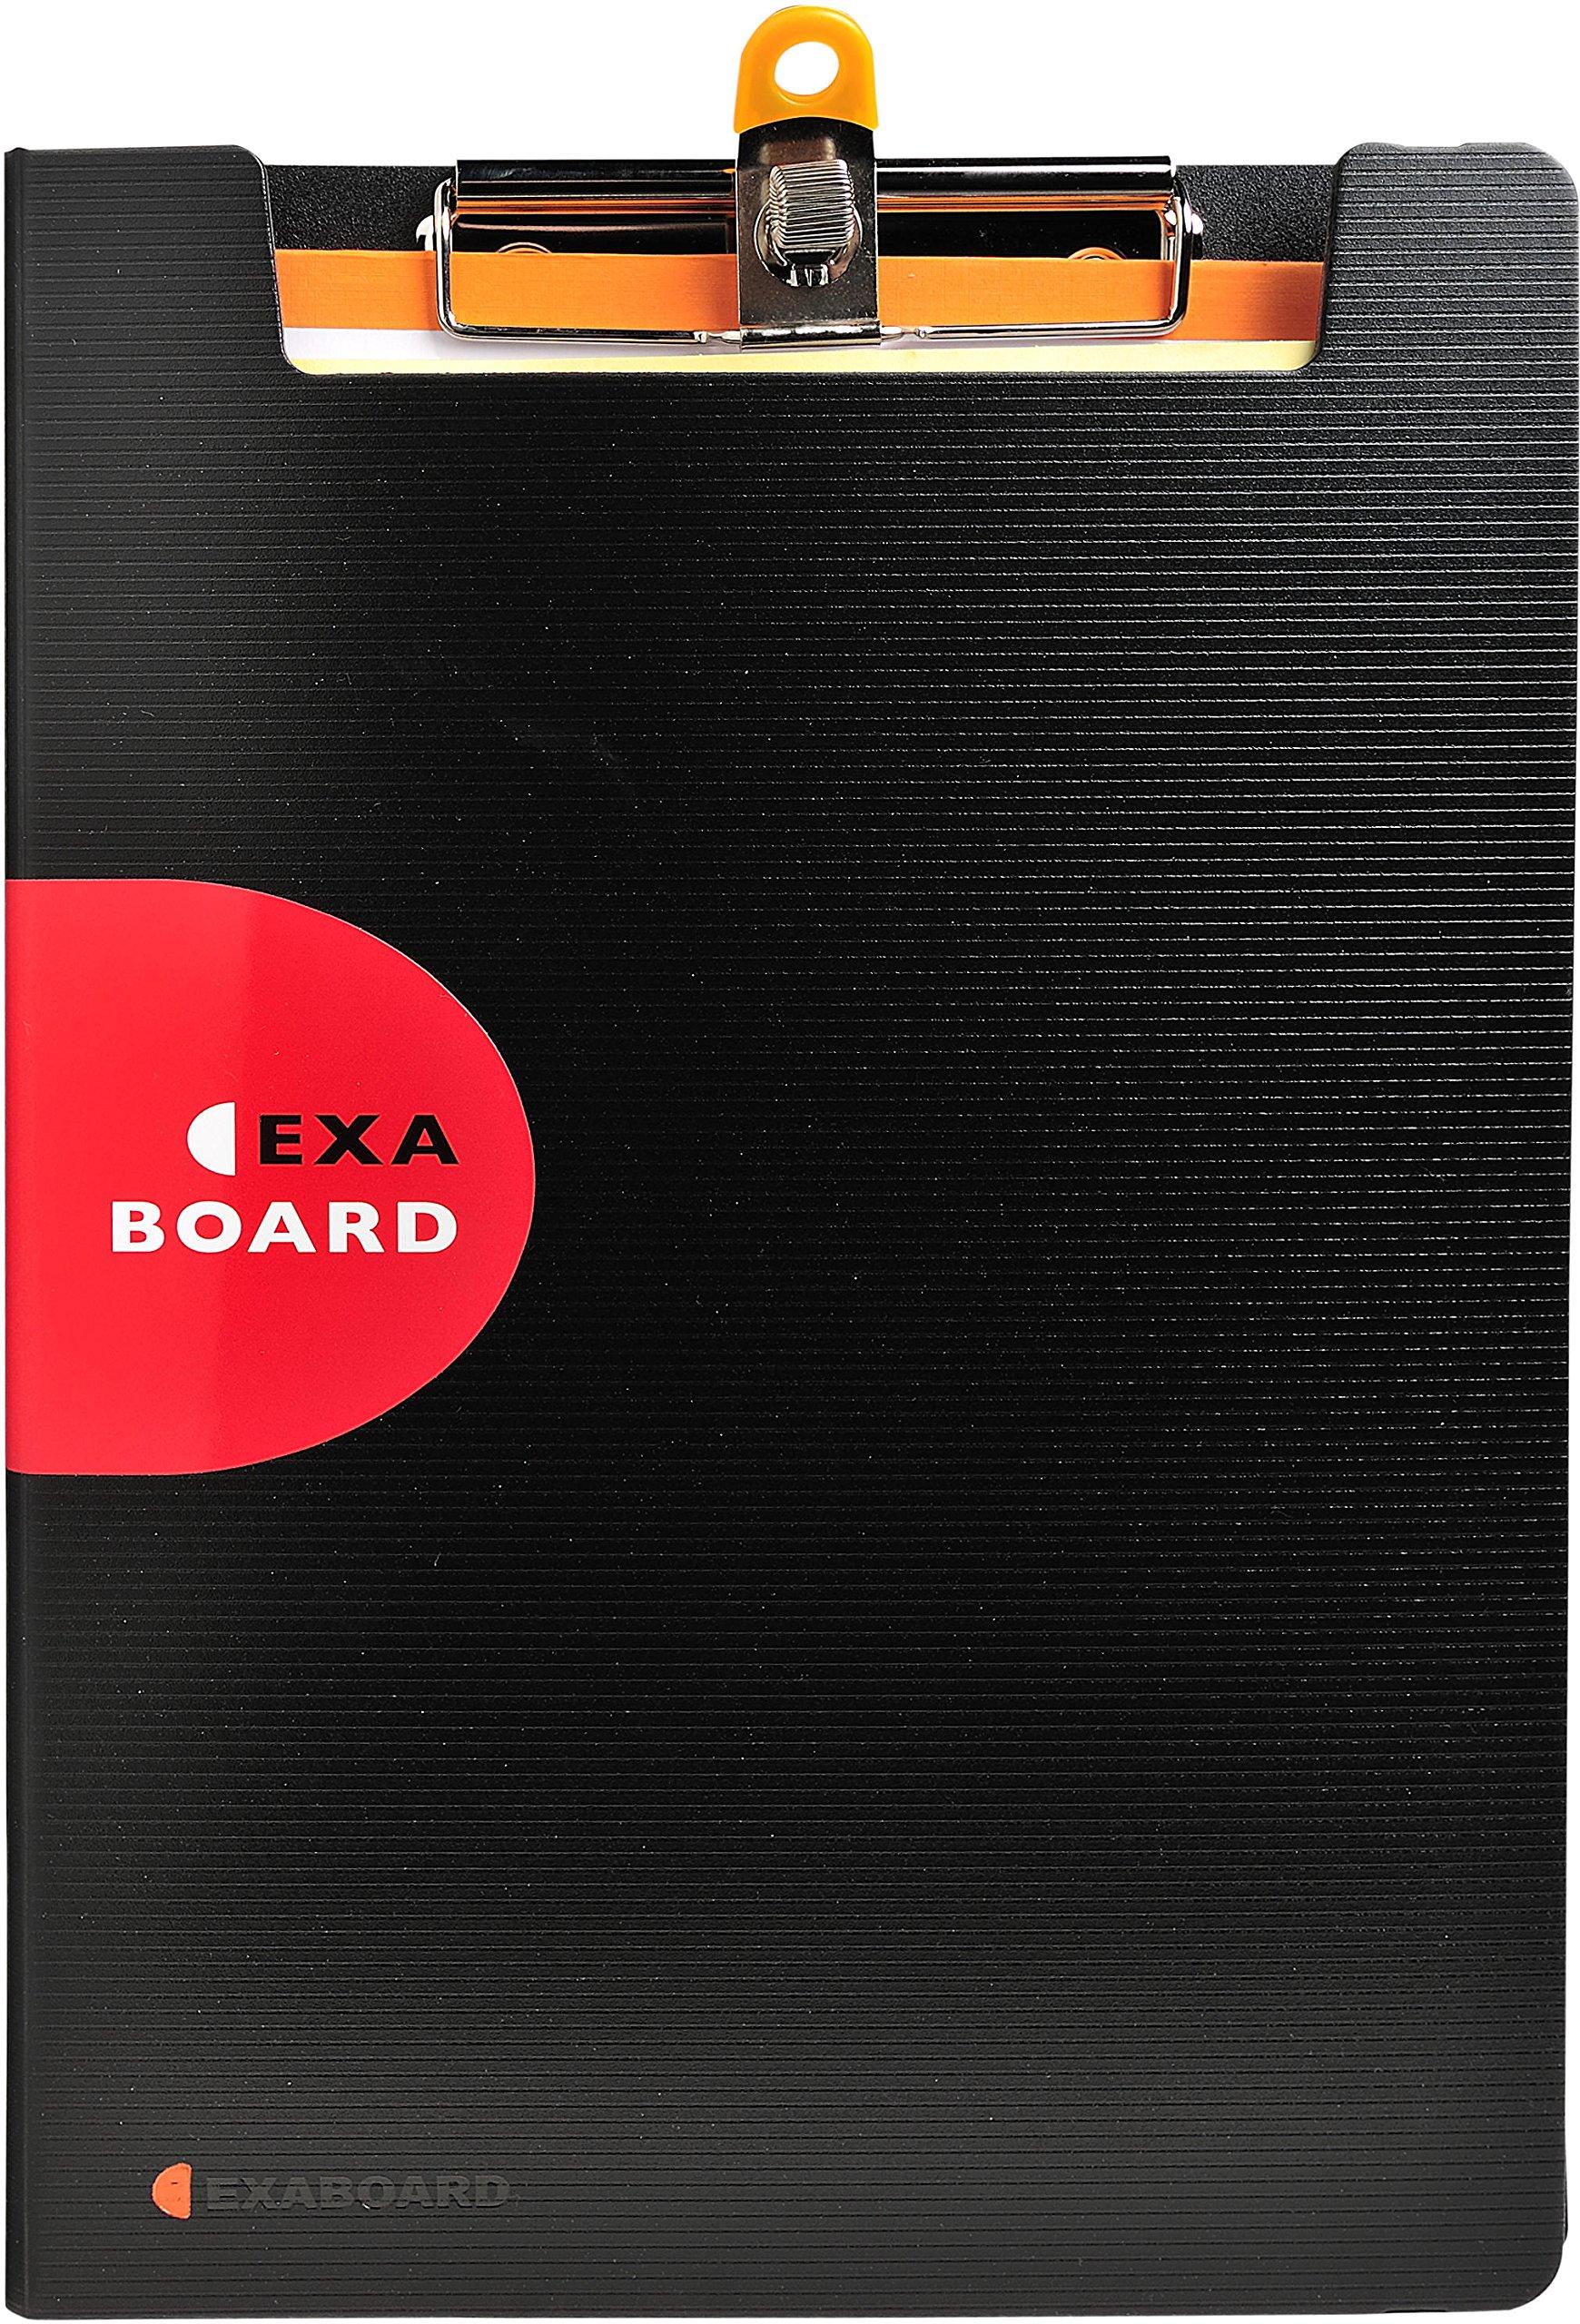 Exacompta Exactive Exaboard Foldover Clipboard, Black